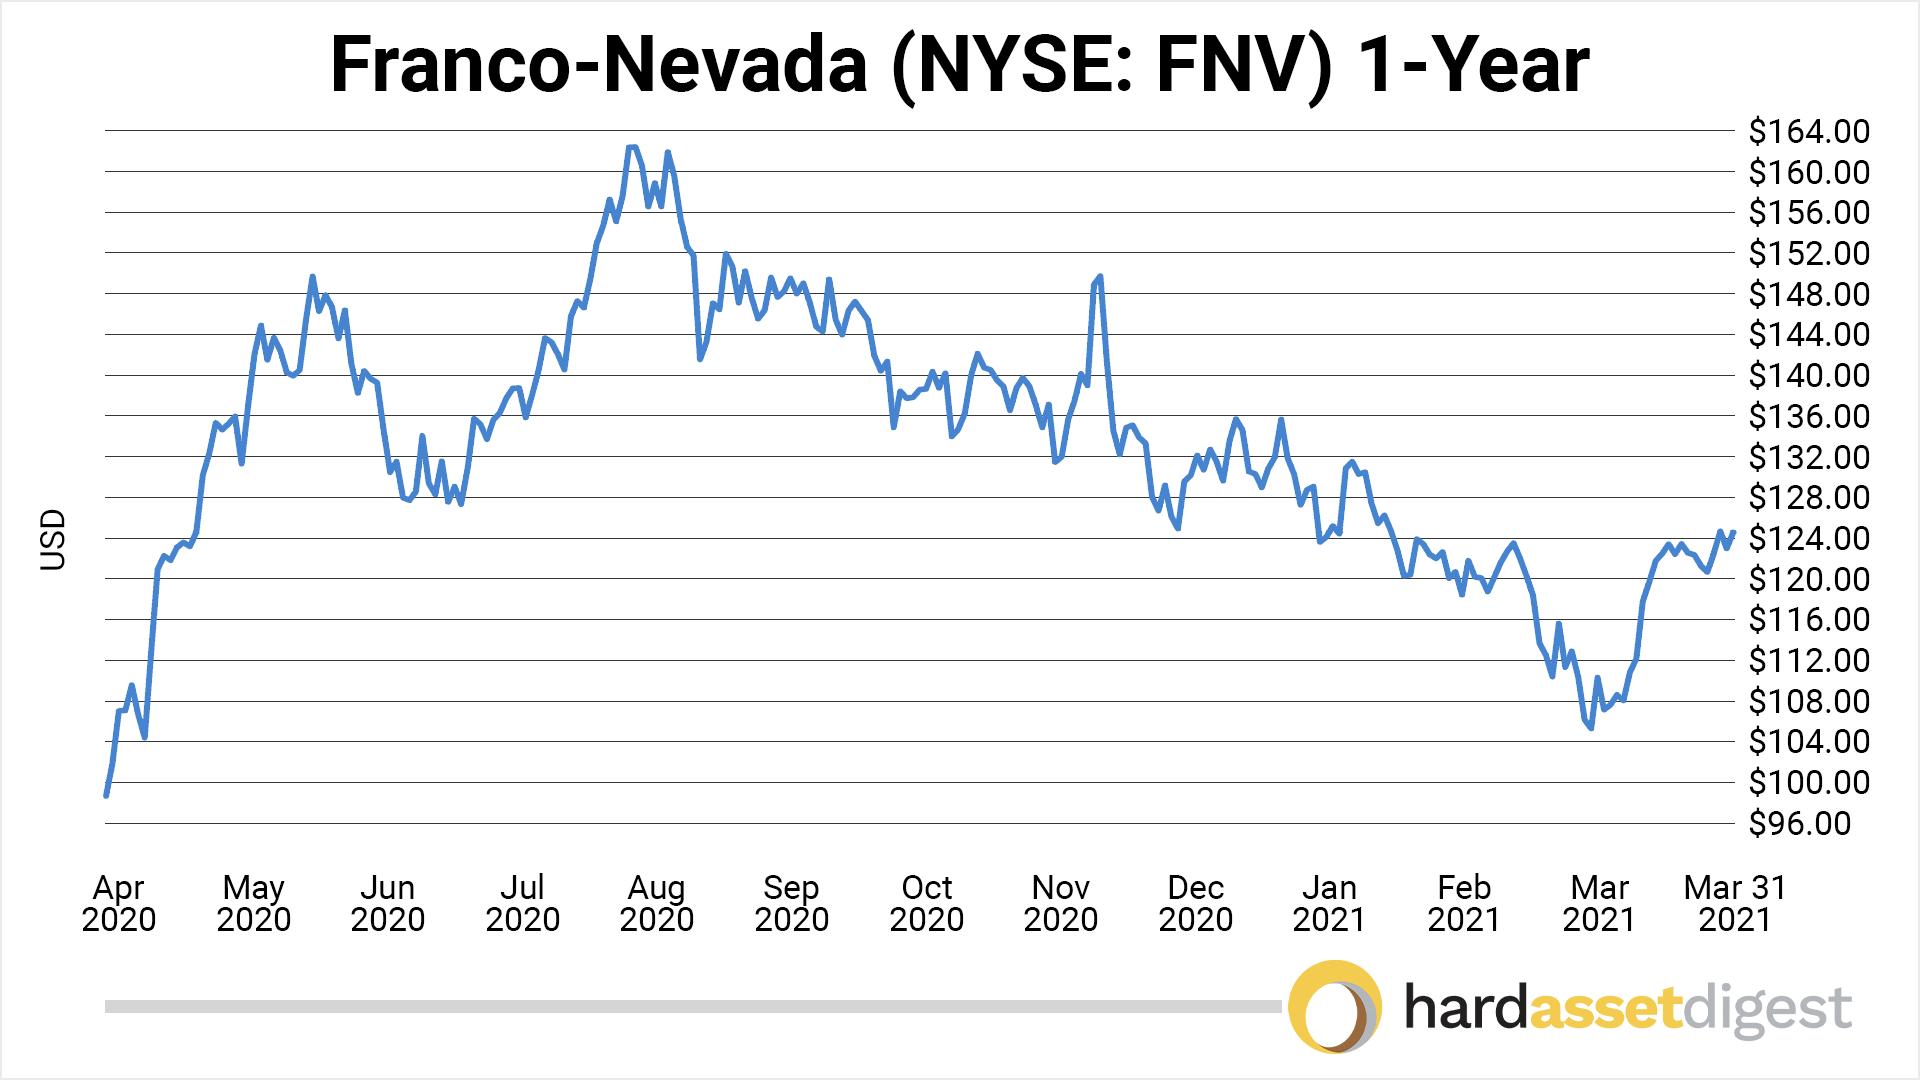 chart-franco-nevada-1-year